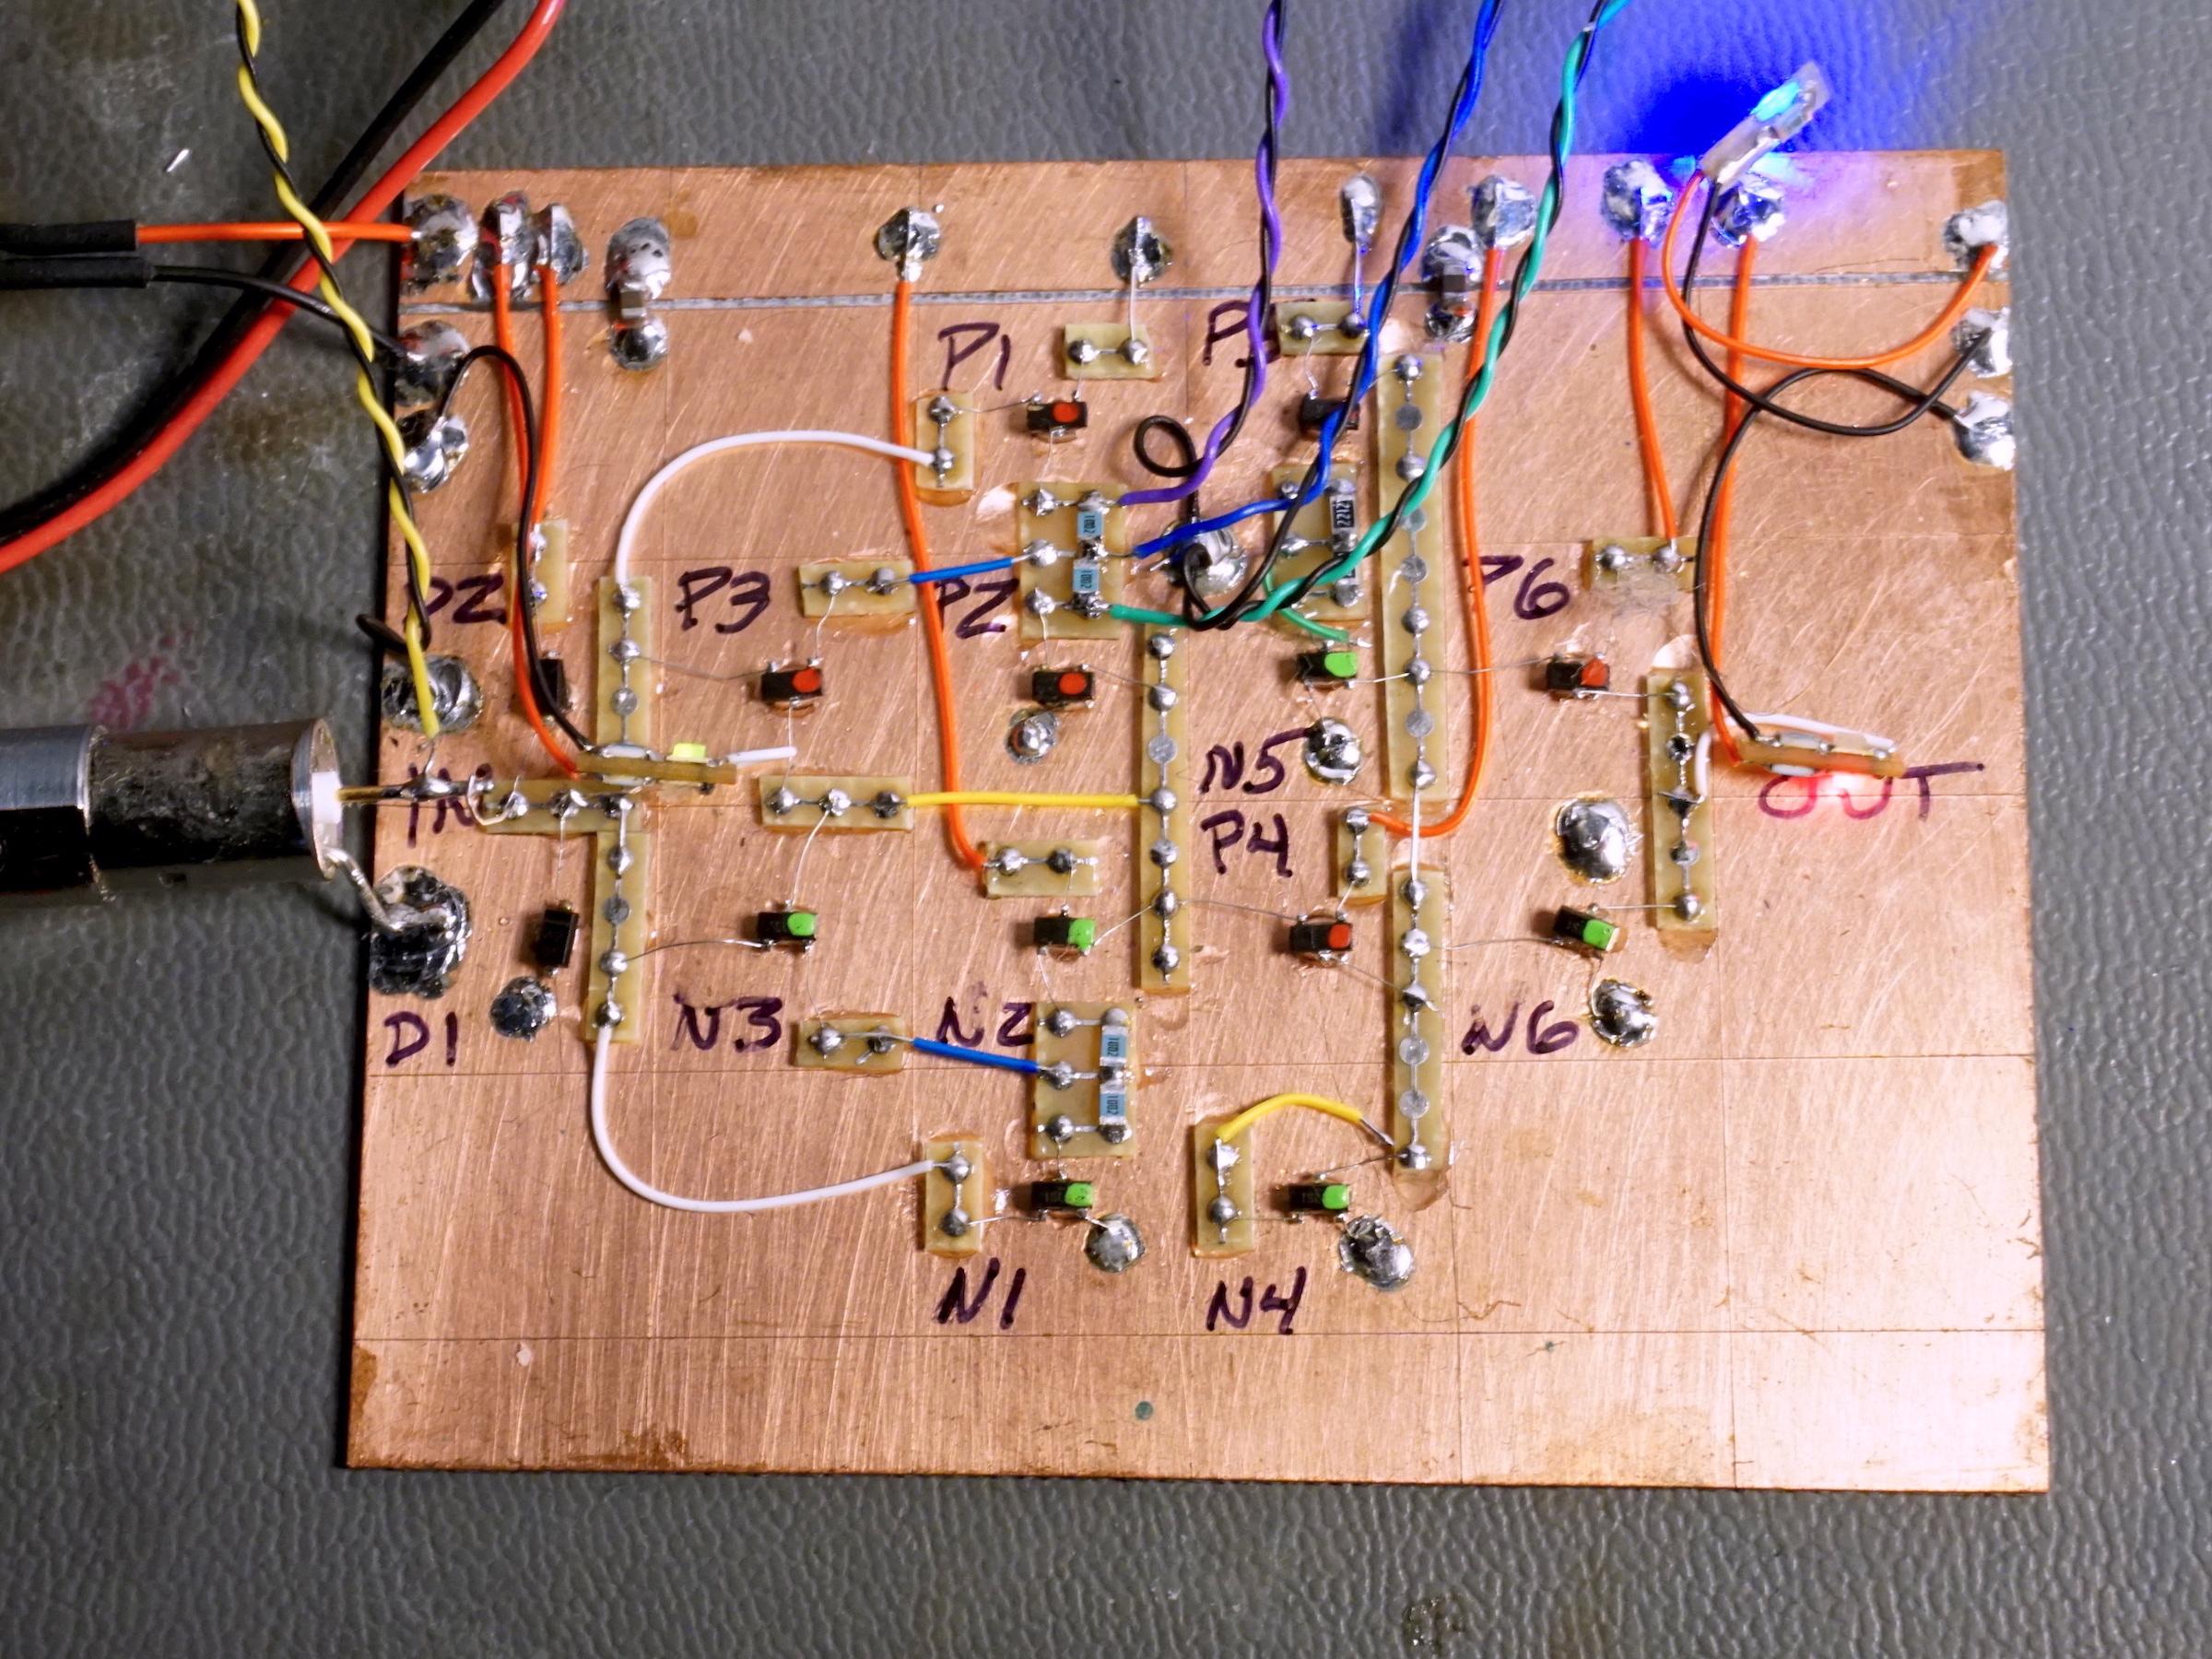 components_CMOS-A-P1-P2.jpg